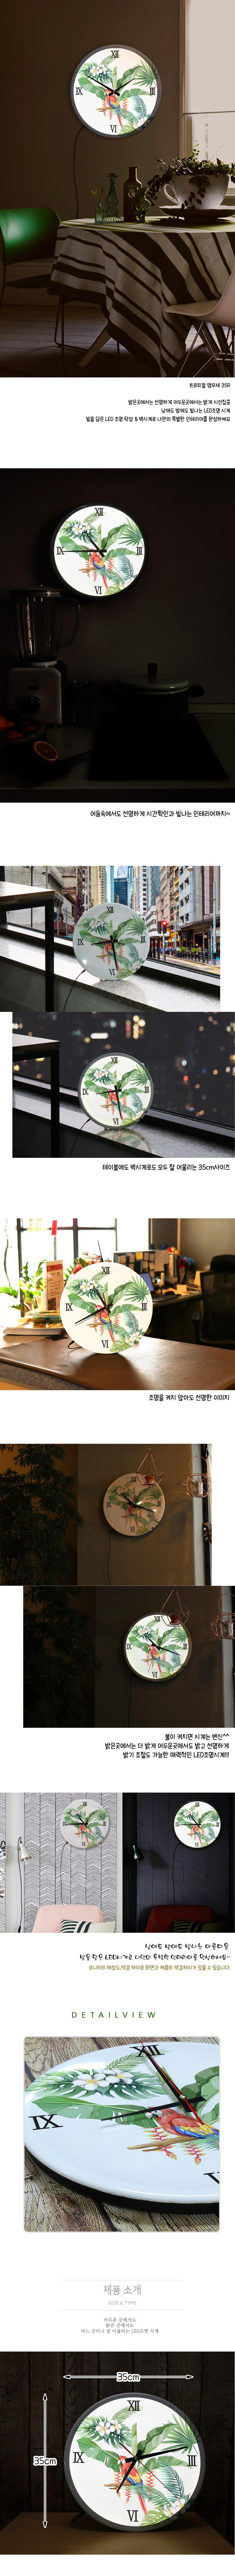 LED시계액자35R_트로피컬앵무새 - 꾸밈, 50,400원, 벽시계, 디자인벽시계